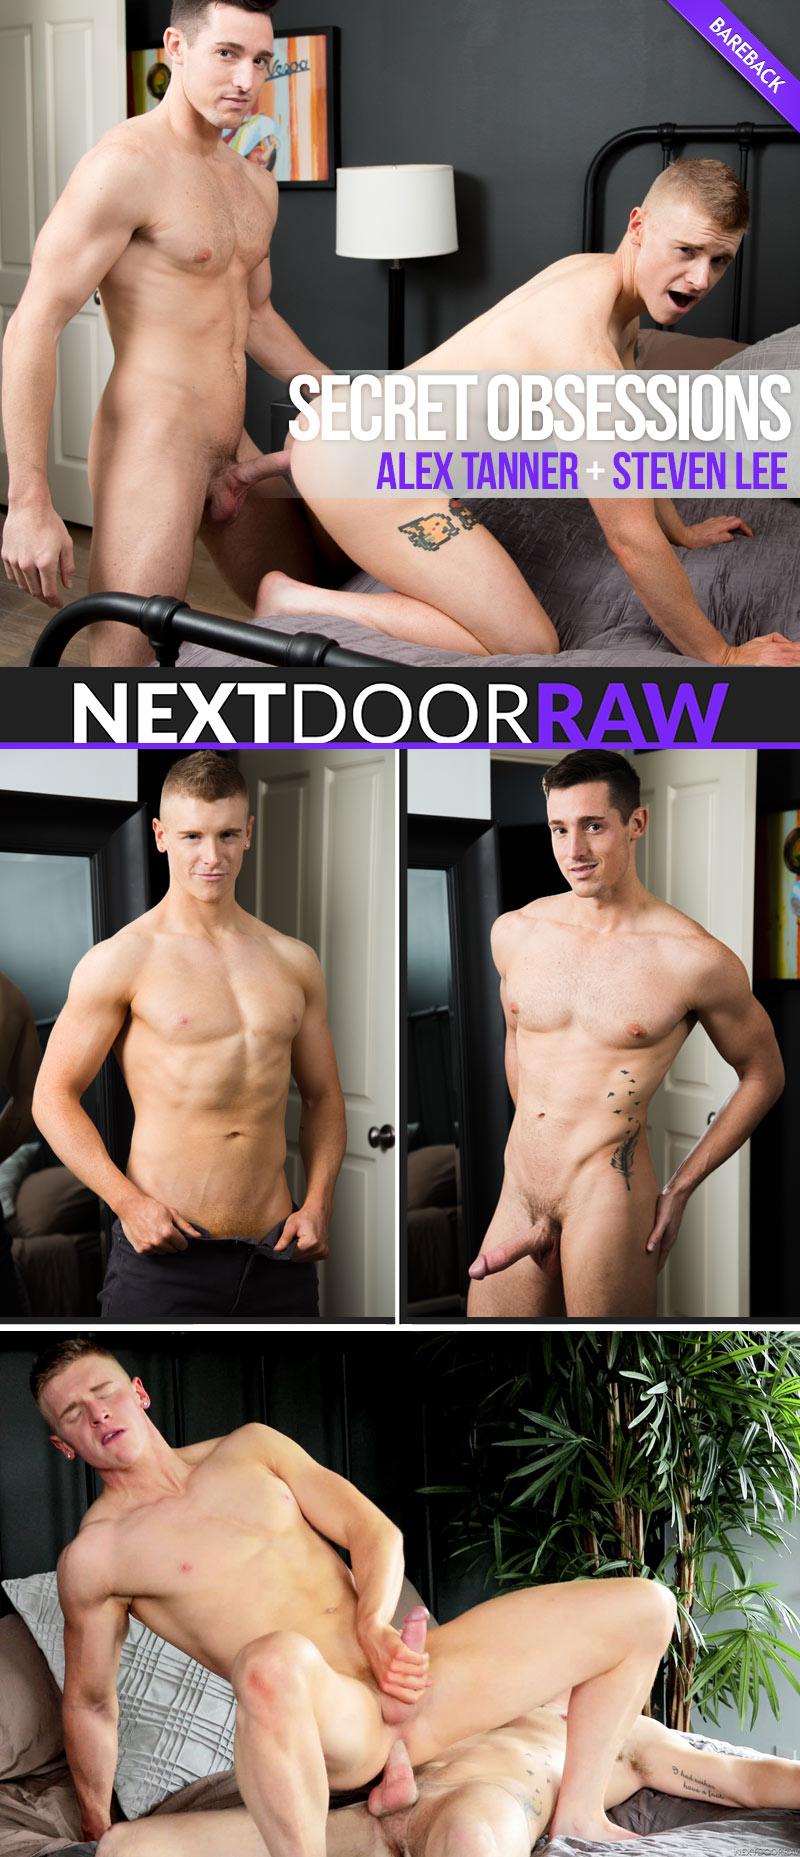 Secret Obsessions (Steven Lee Fucks Alex Tanner) (Bareback) at NextDoorRAW!